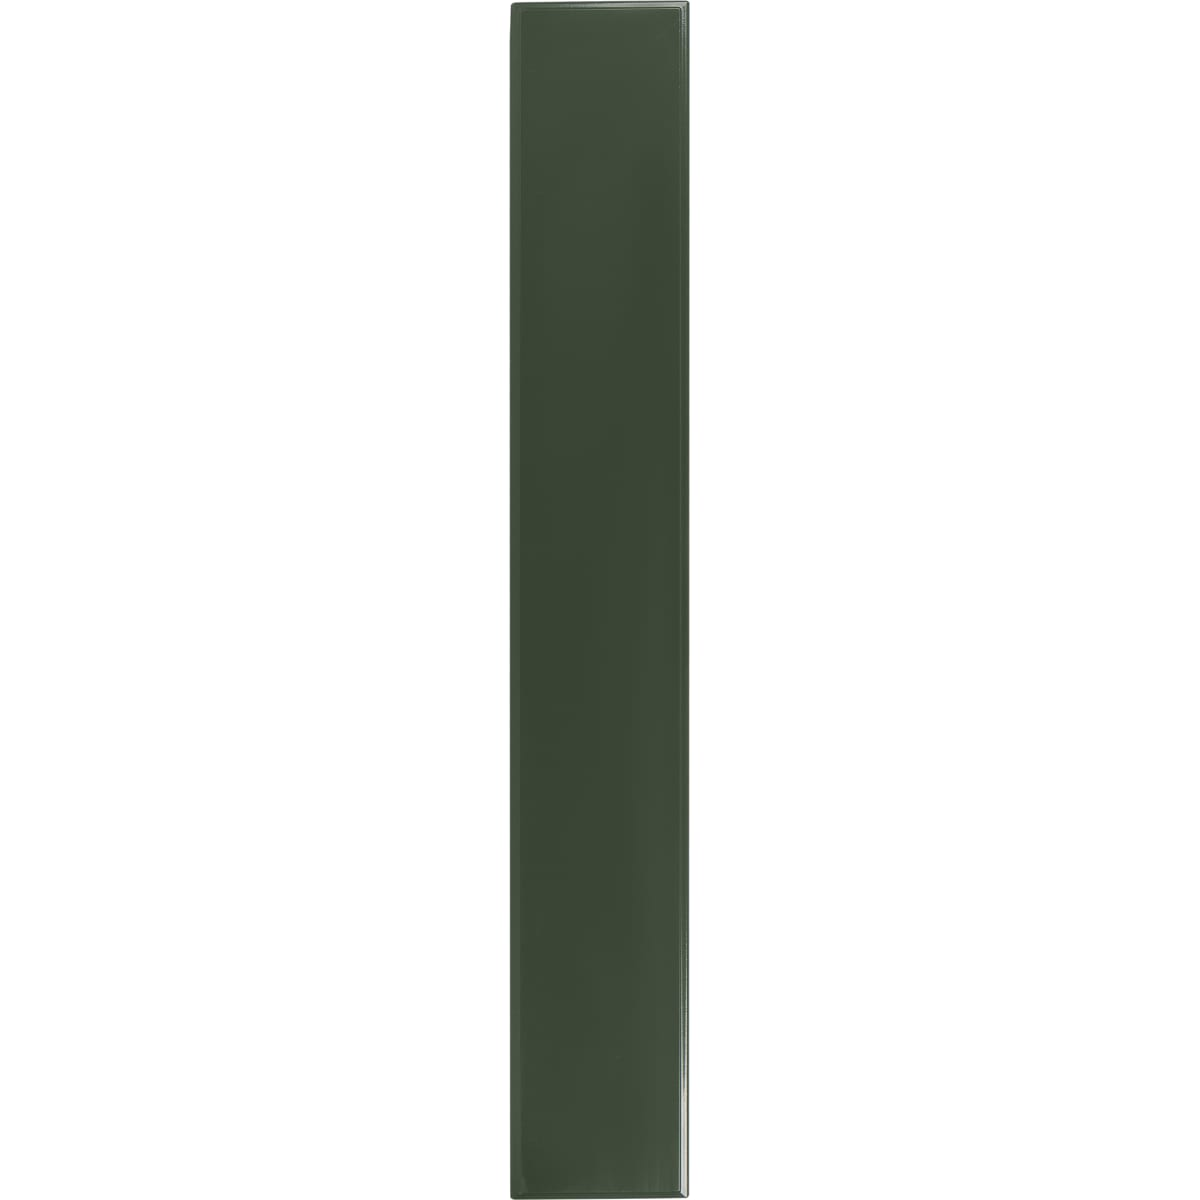 Дверь для шкафа Delinia ID «Мегион» 15x102.4 см, МДФ, цвет тёмно-серый